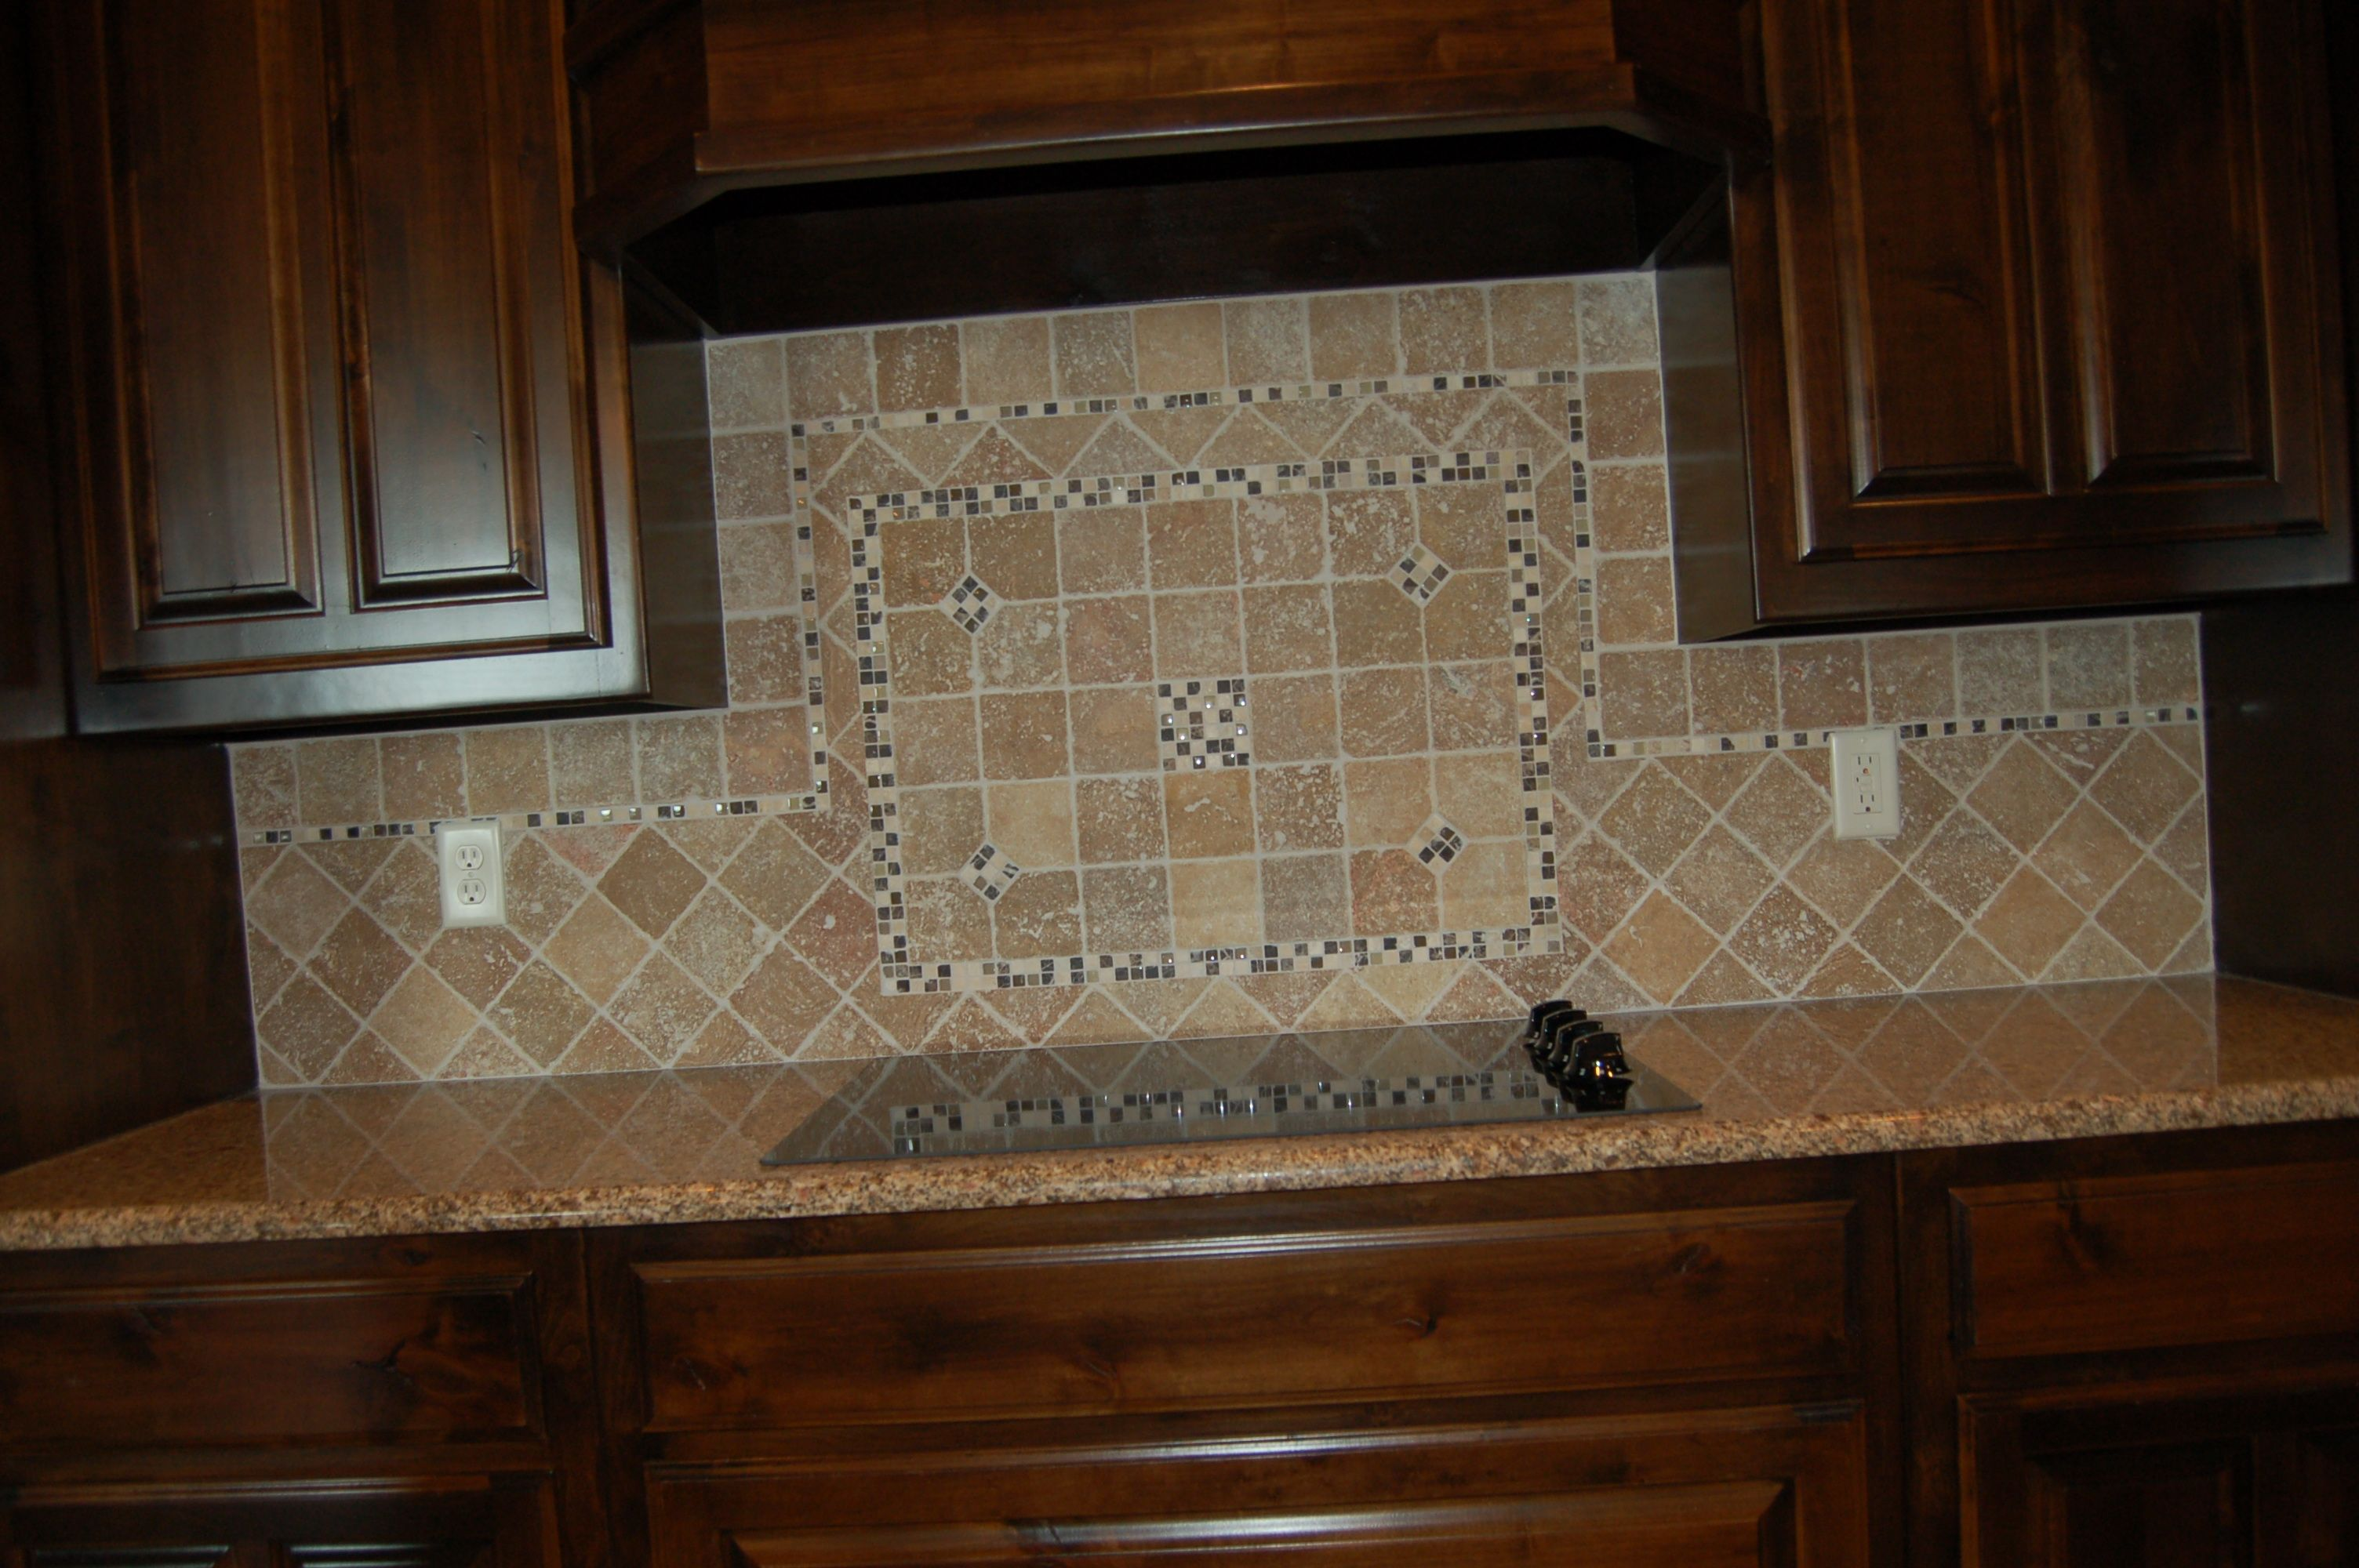 Tumbled Marble Tile Backsplash Mcbee Homes Kitchens Pinterest